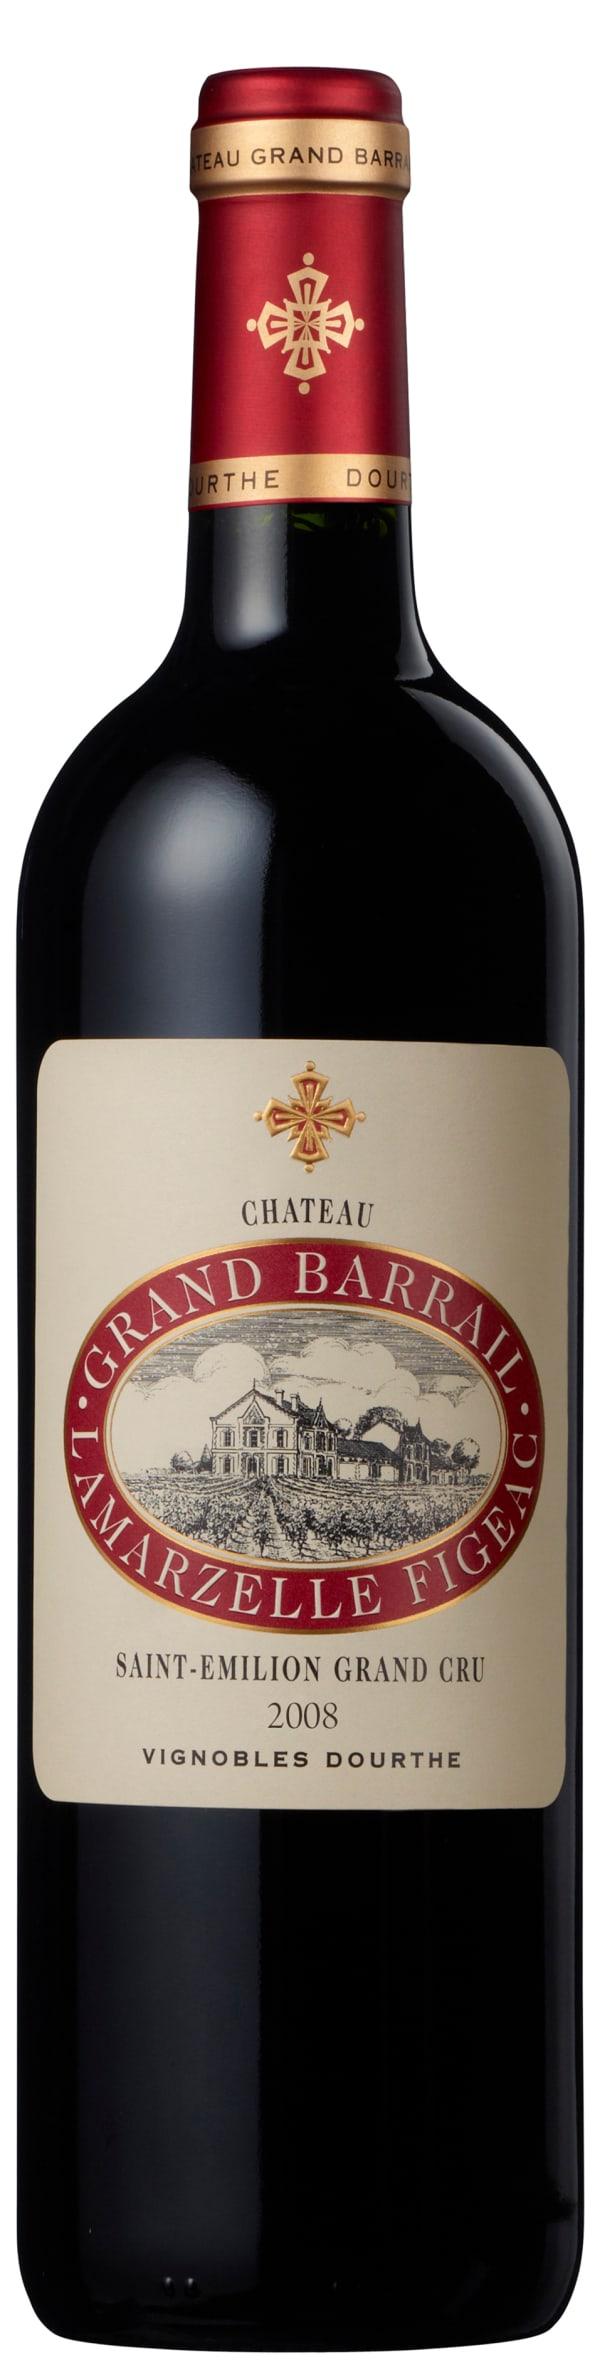 Château Grand Barrail Lamarzelle Figeac 2008